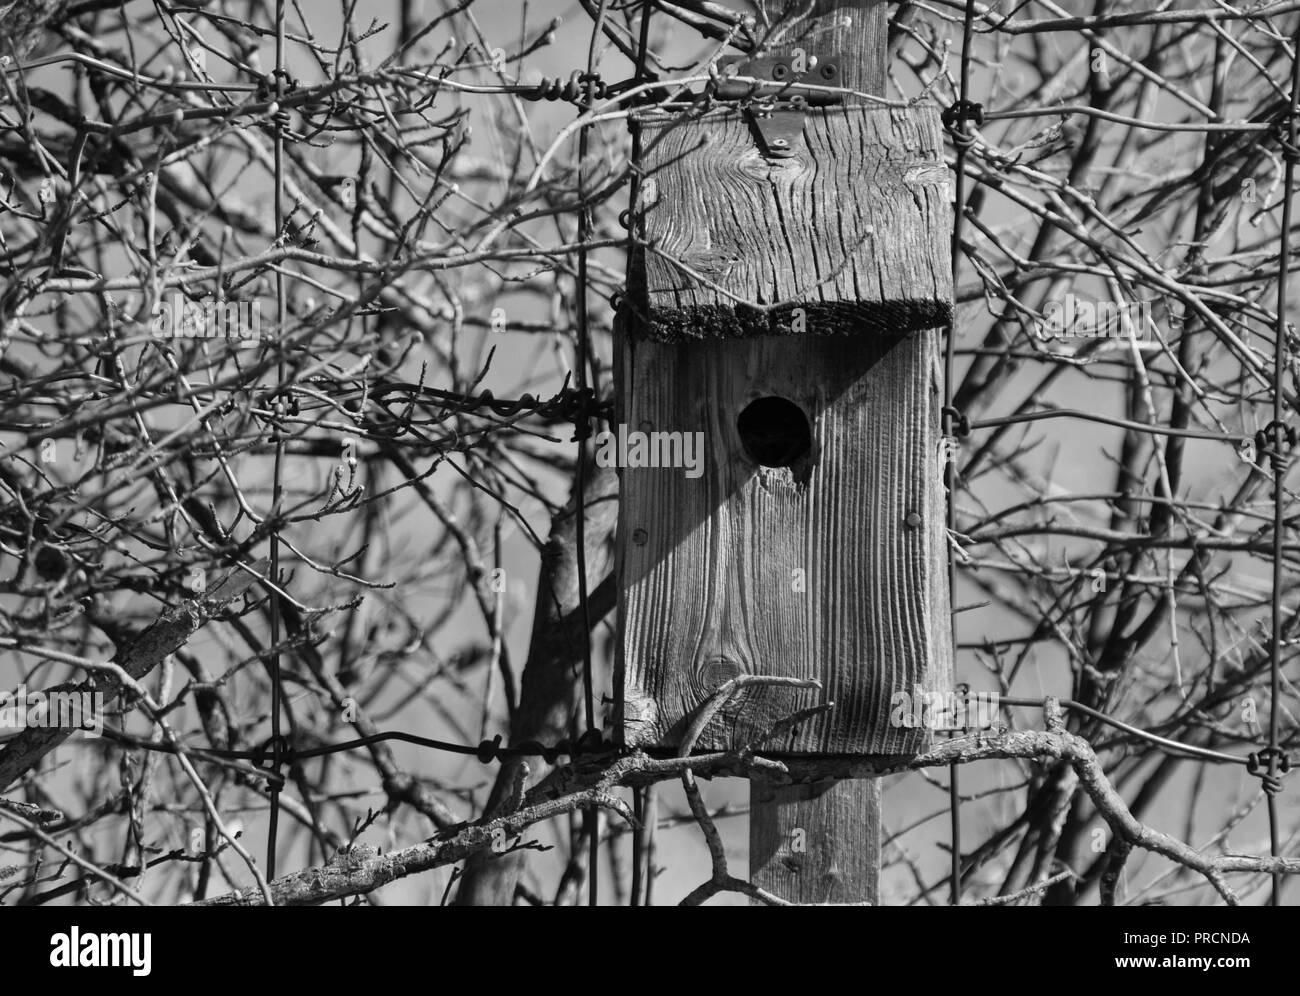 Bird house on the Weaselhead trail in Calgary - Stock Image